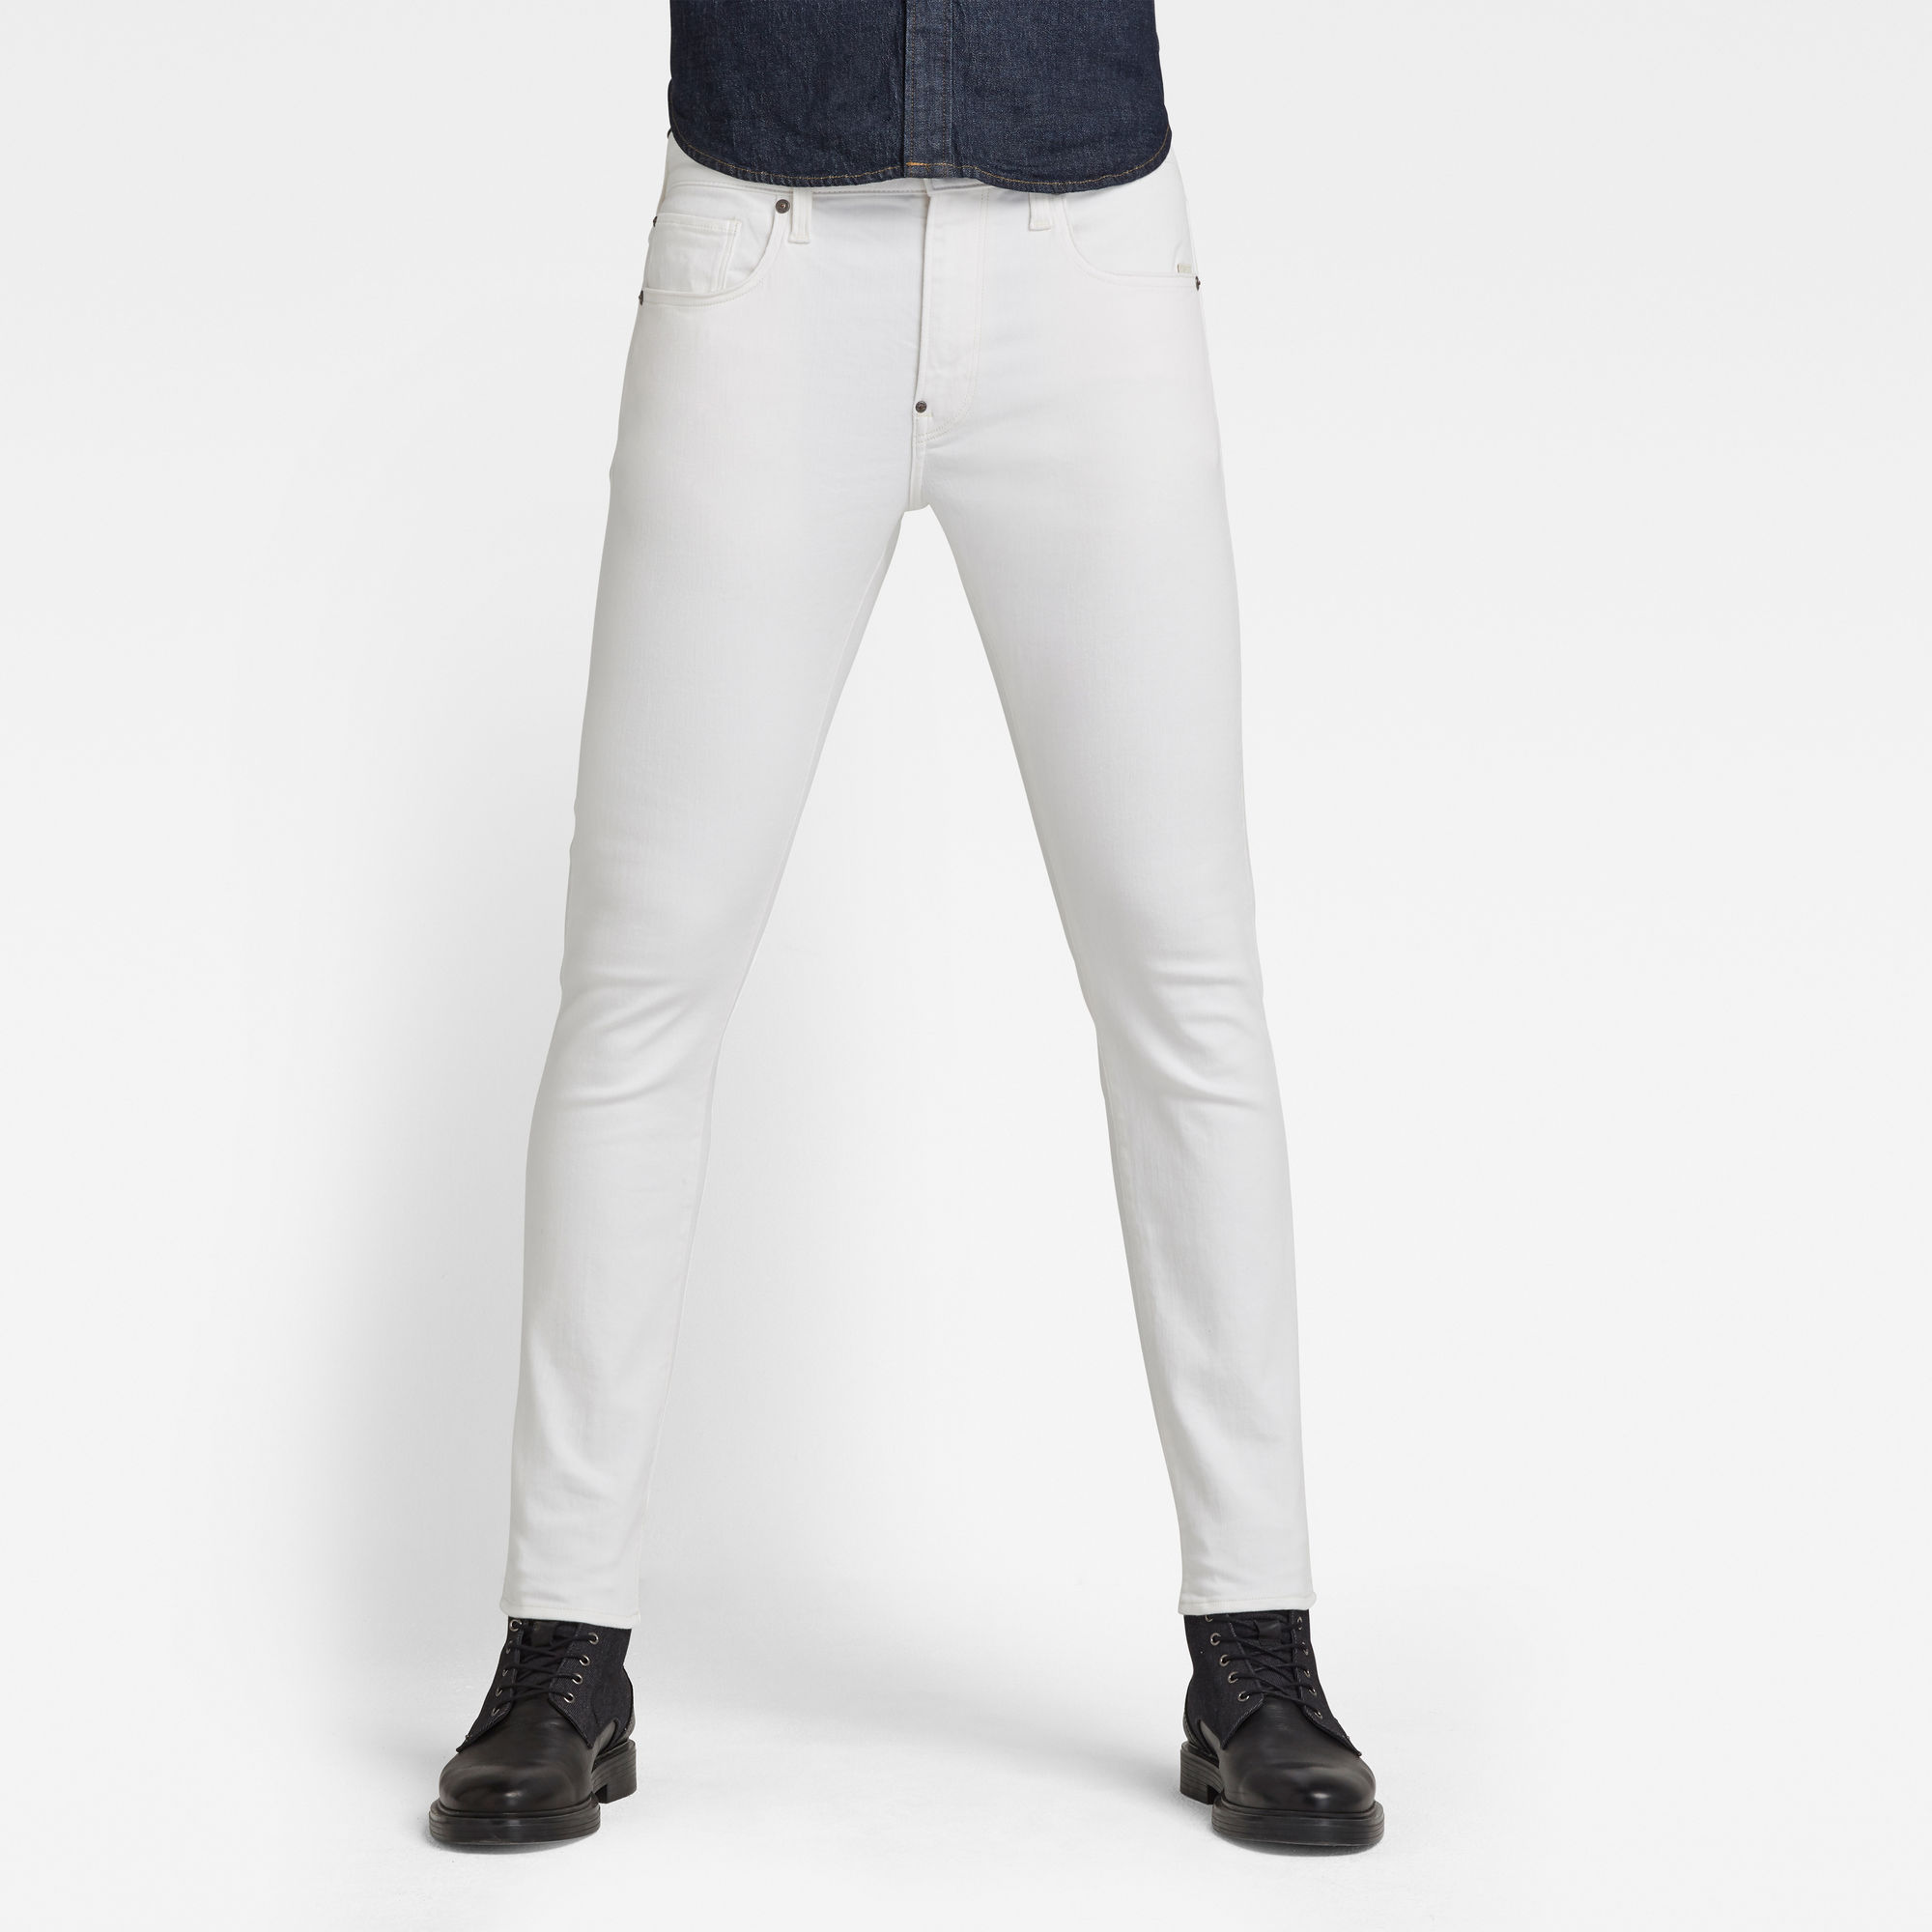 G-Star RAW Heren Revend Skinny Jeans Wit